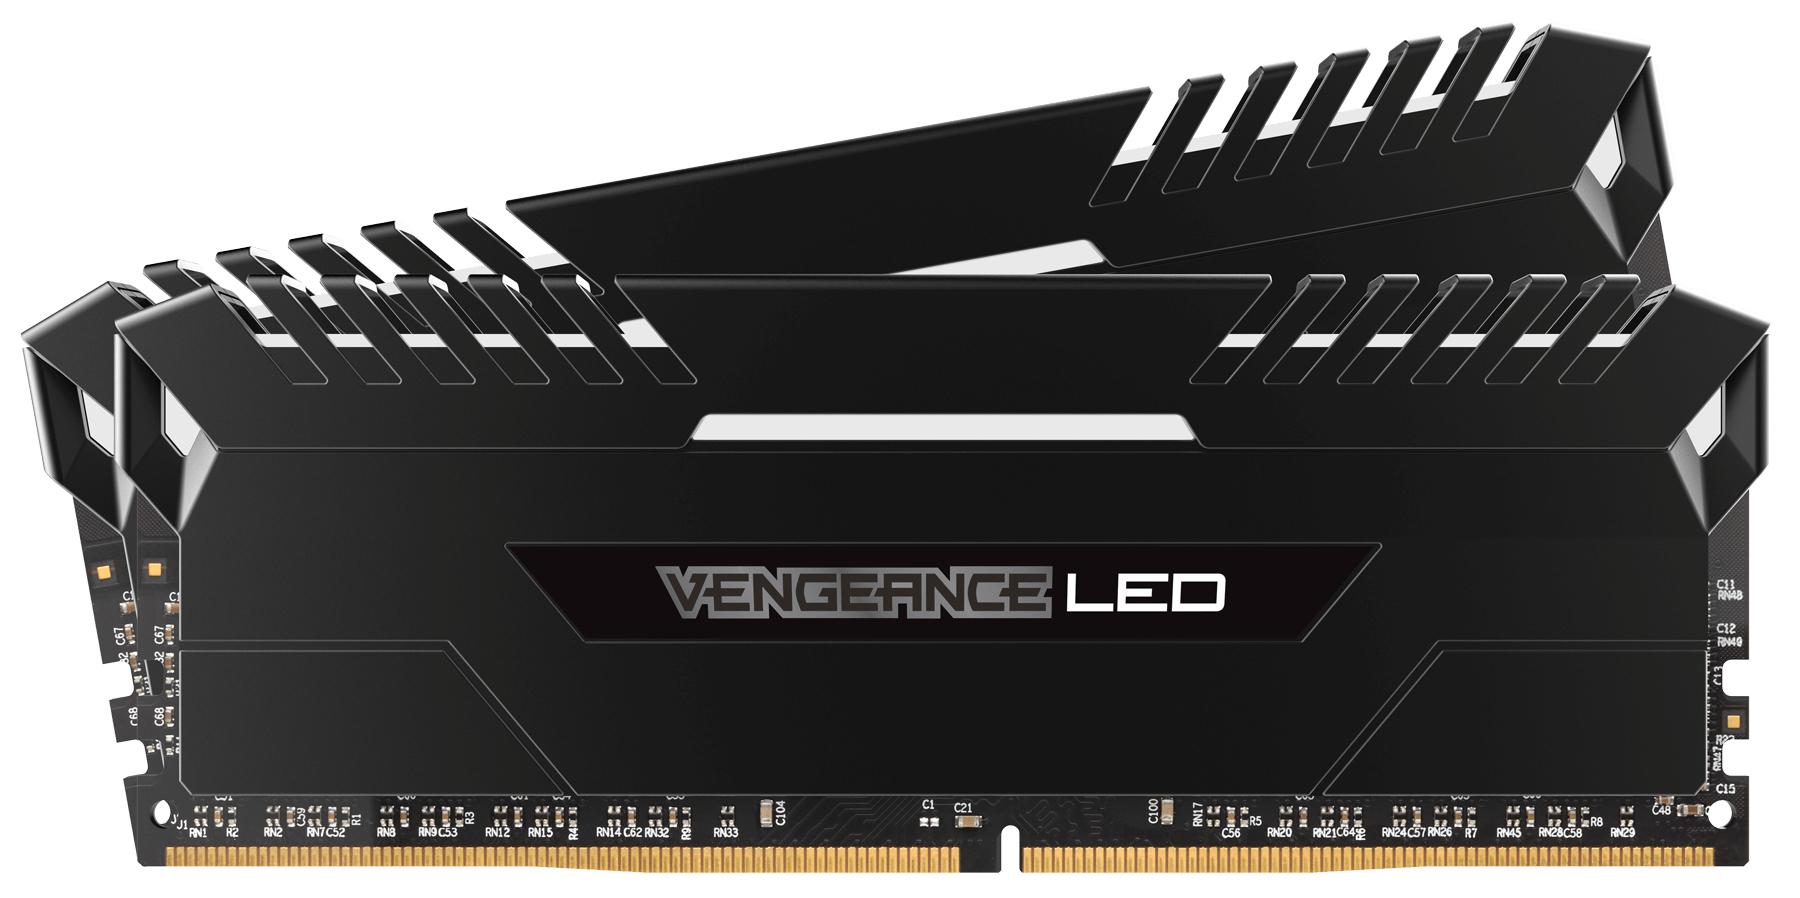 Corsair Vengeance LED 2x8GB DDR4-3200 16GB DDR4 3200MHz memory module